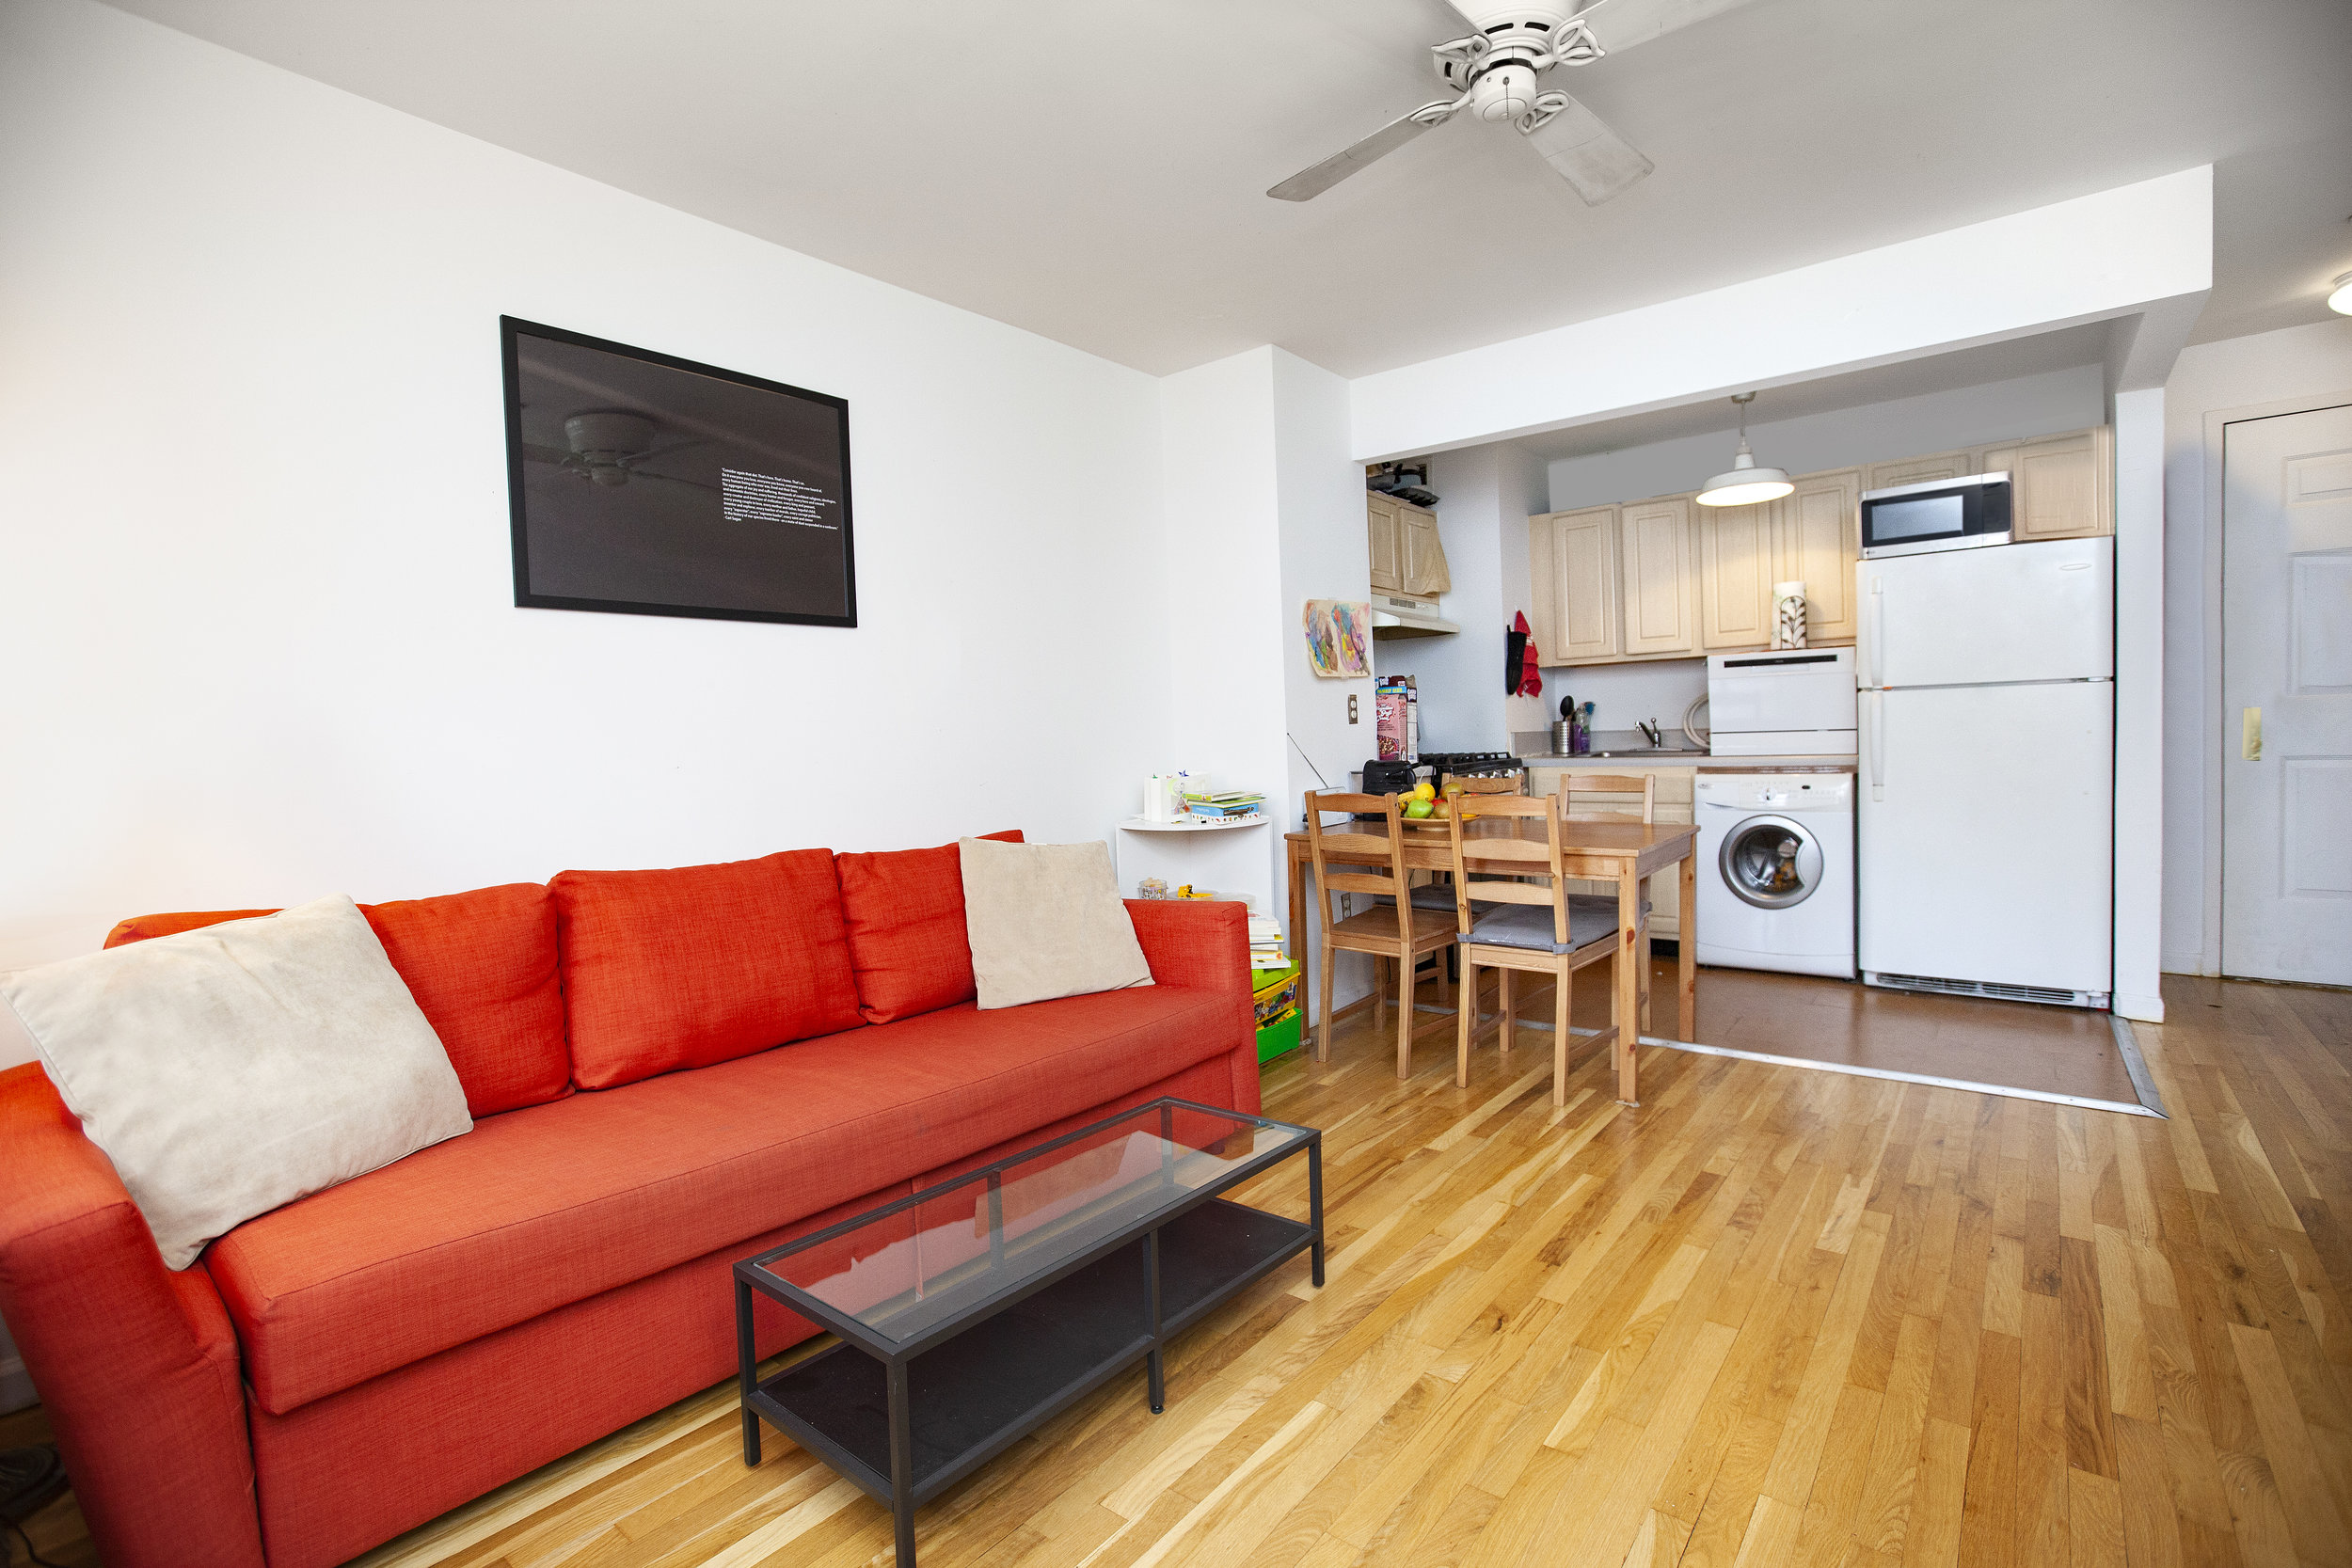 East_11th_Street_619_4B_Living_Room_Reverse_.jpg